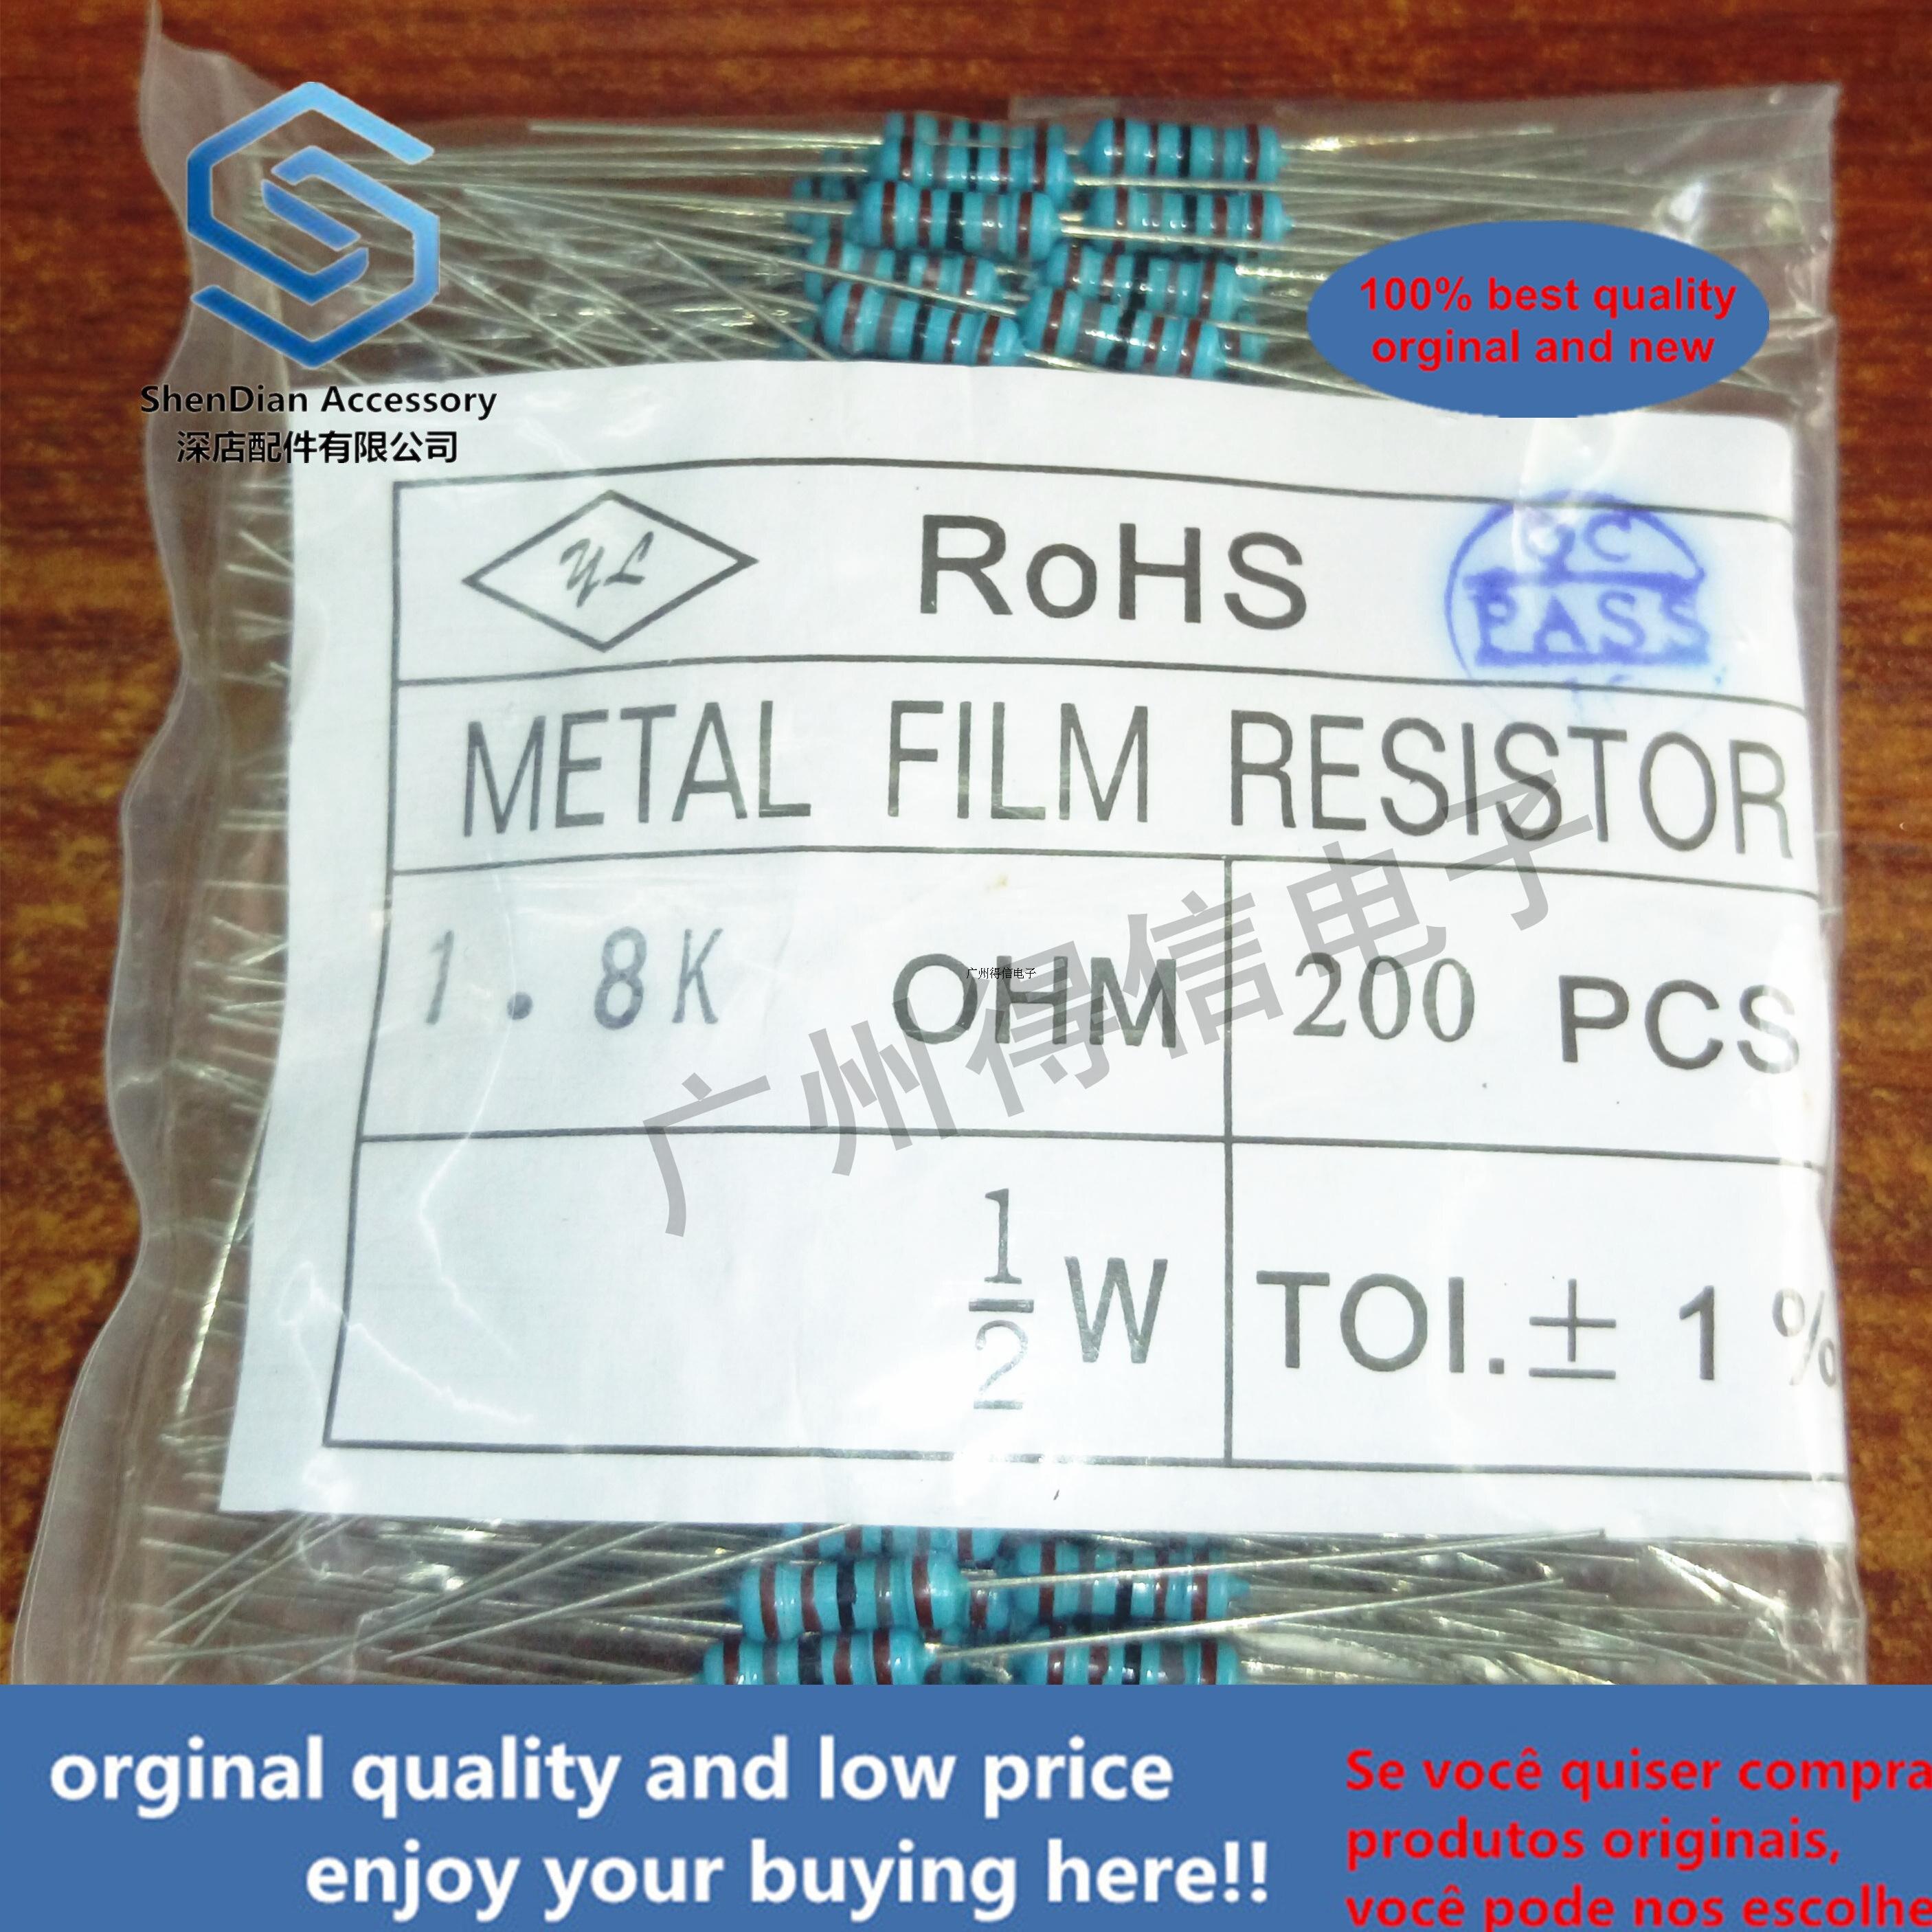 200pcs 1 / 2W 2R 2Euro 1% Brand New Metal Film Iron Feet Resistor Bag 200 Pcs Per Pack